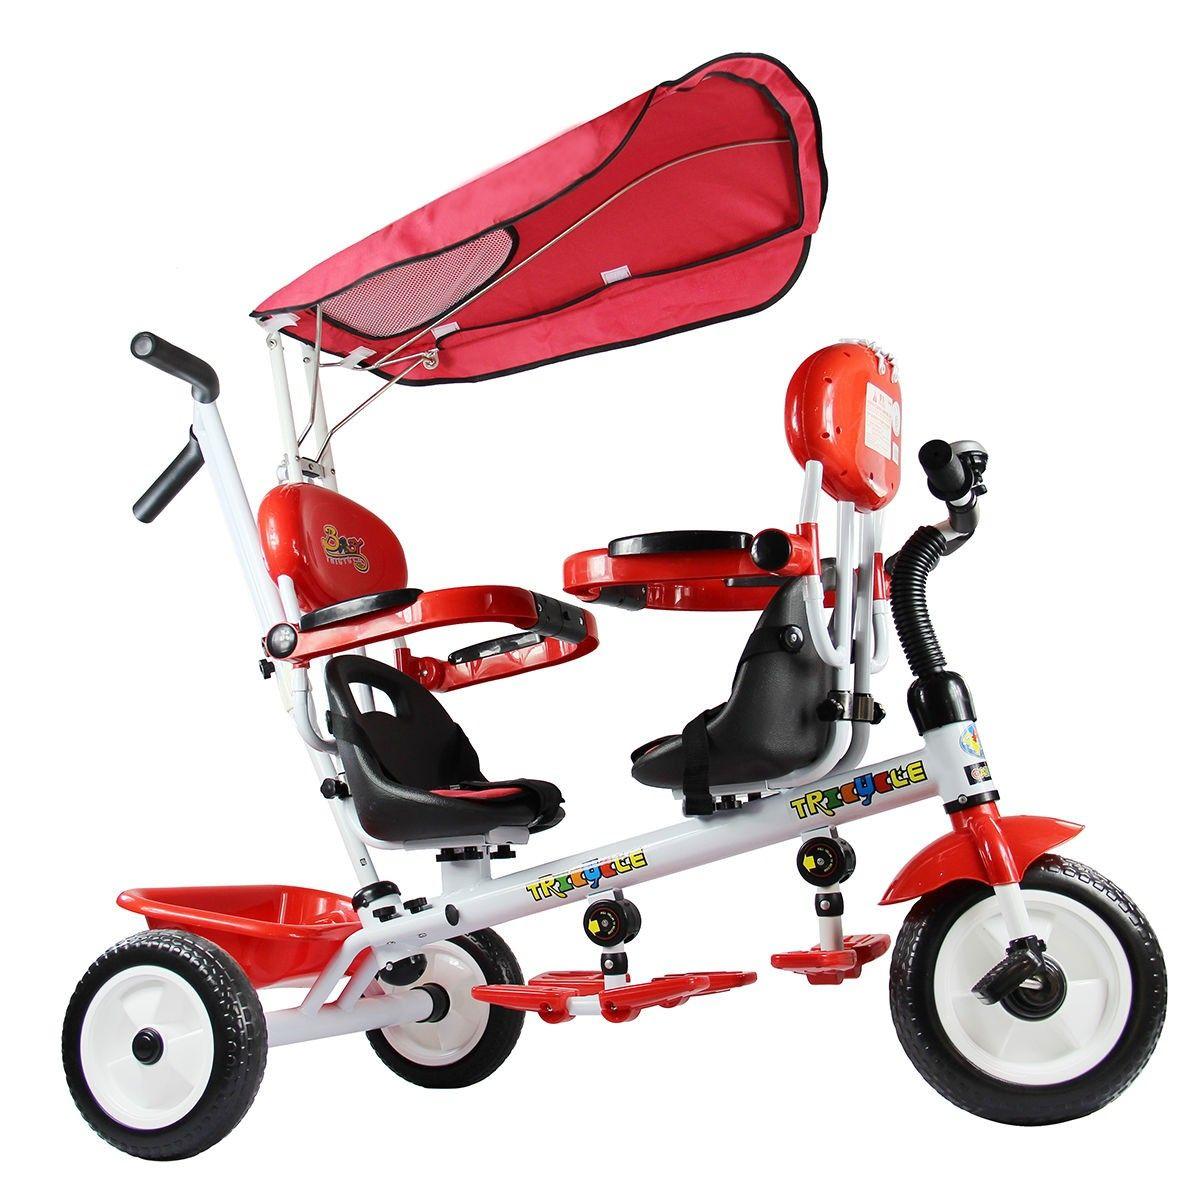 Costway 4 In 1 Kids Child Trike Tricycle 3 Wheel Bike W